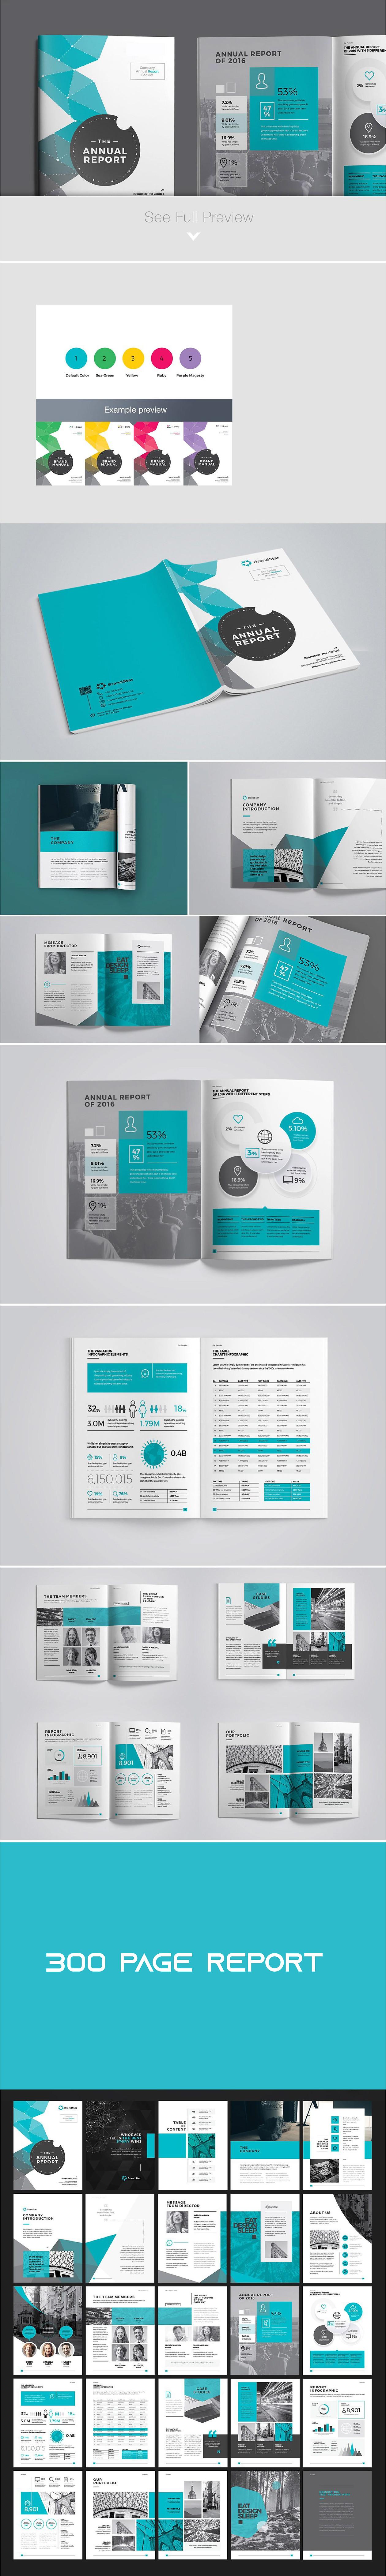 annual report-02.jpg